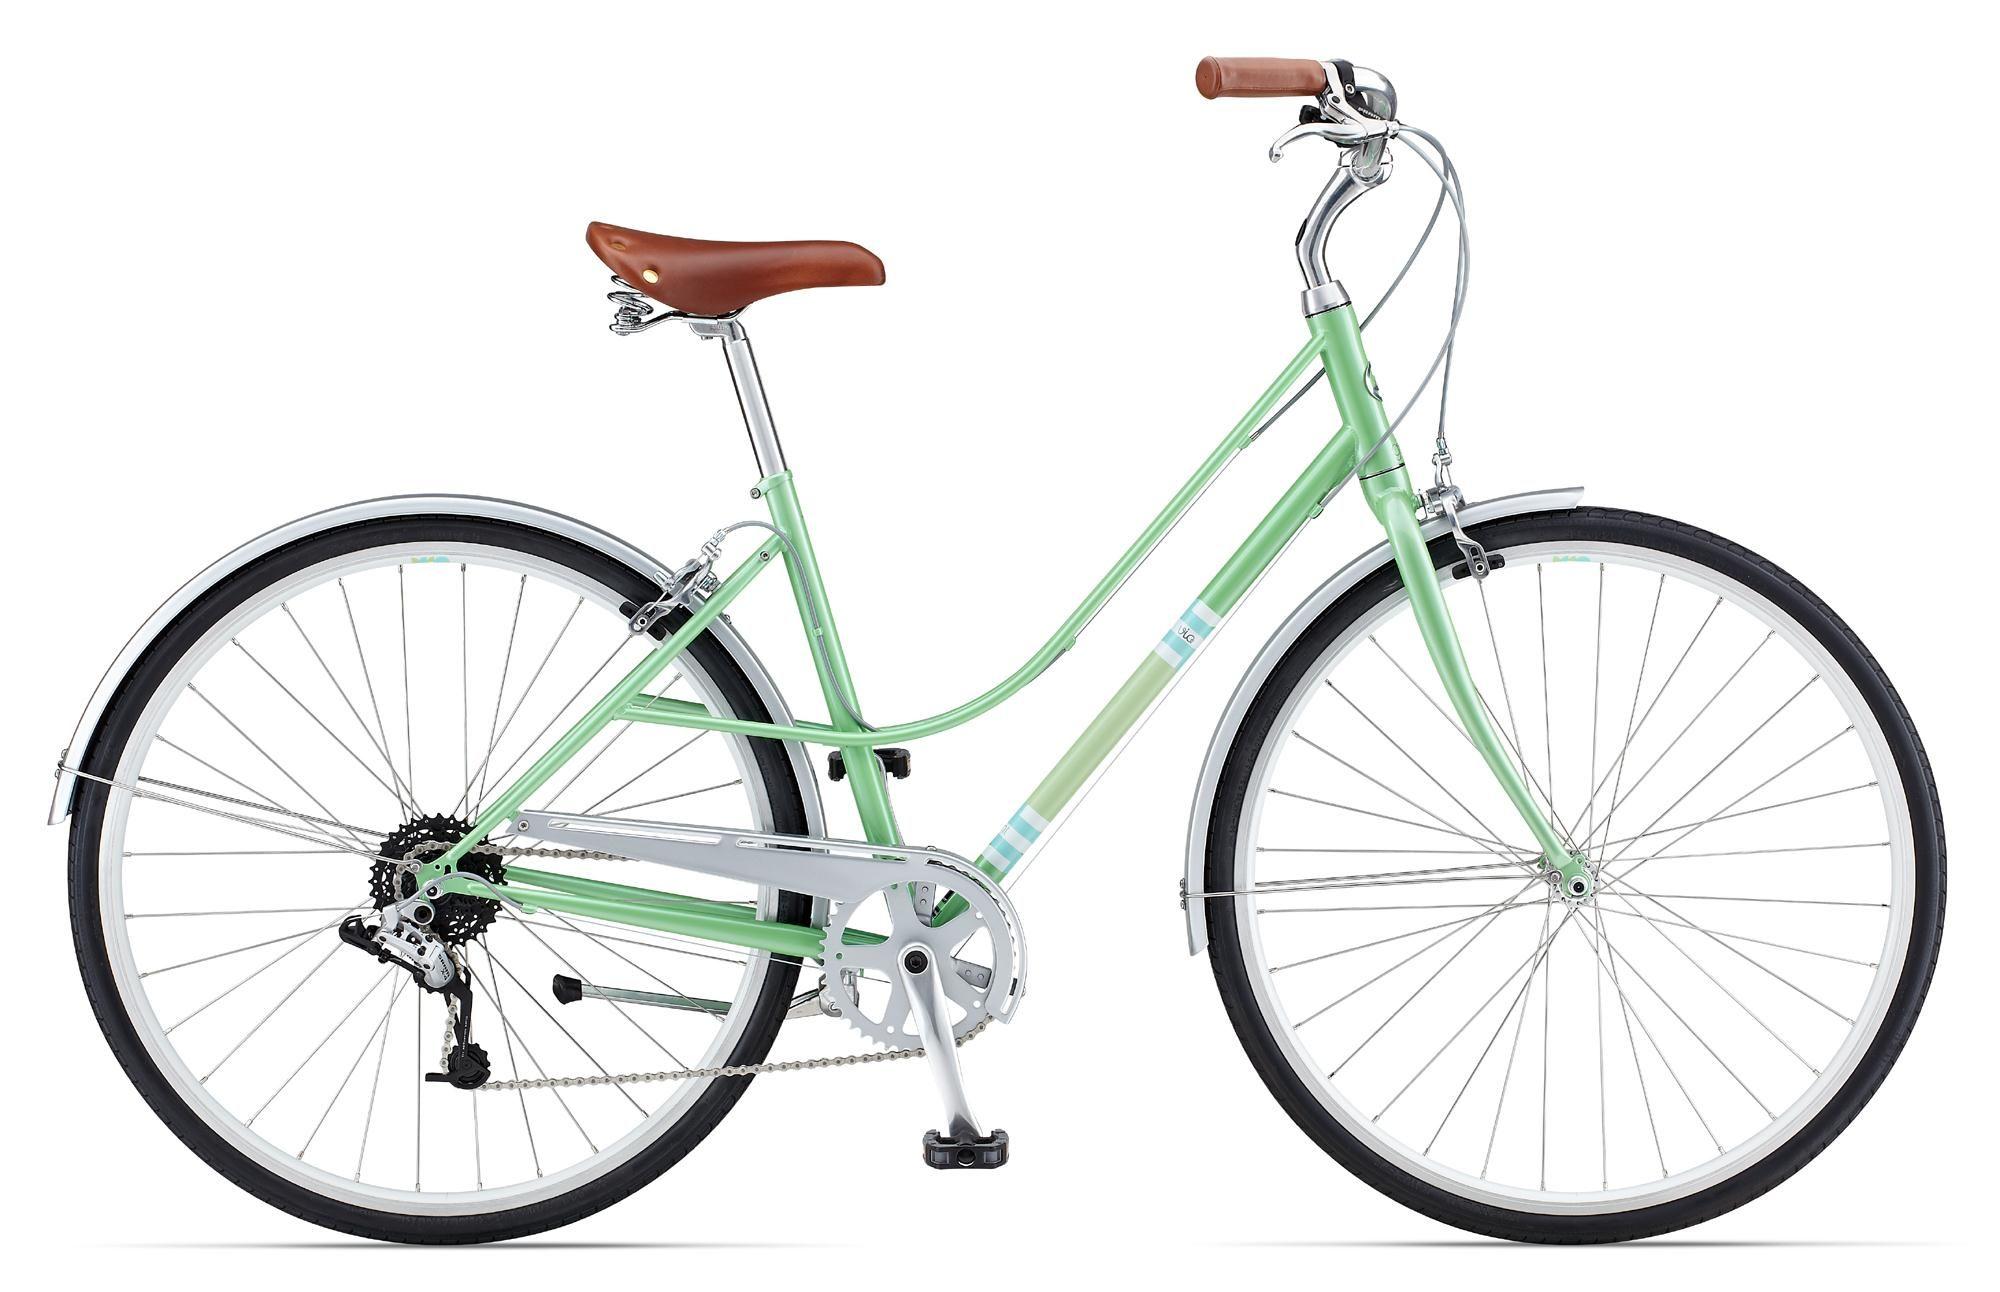 Giant Via 2 W Giant Bicycle Bicycle Bicycle Maintenance